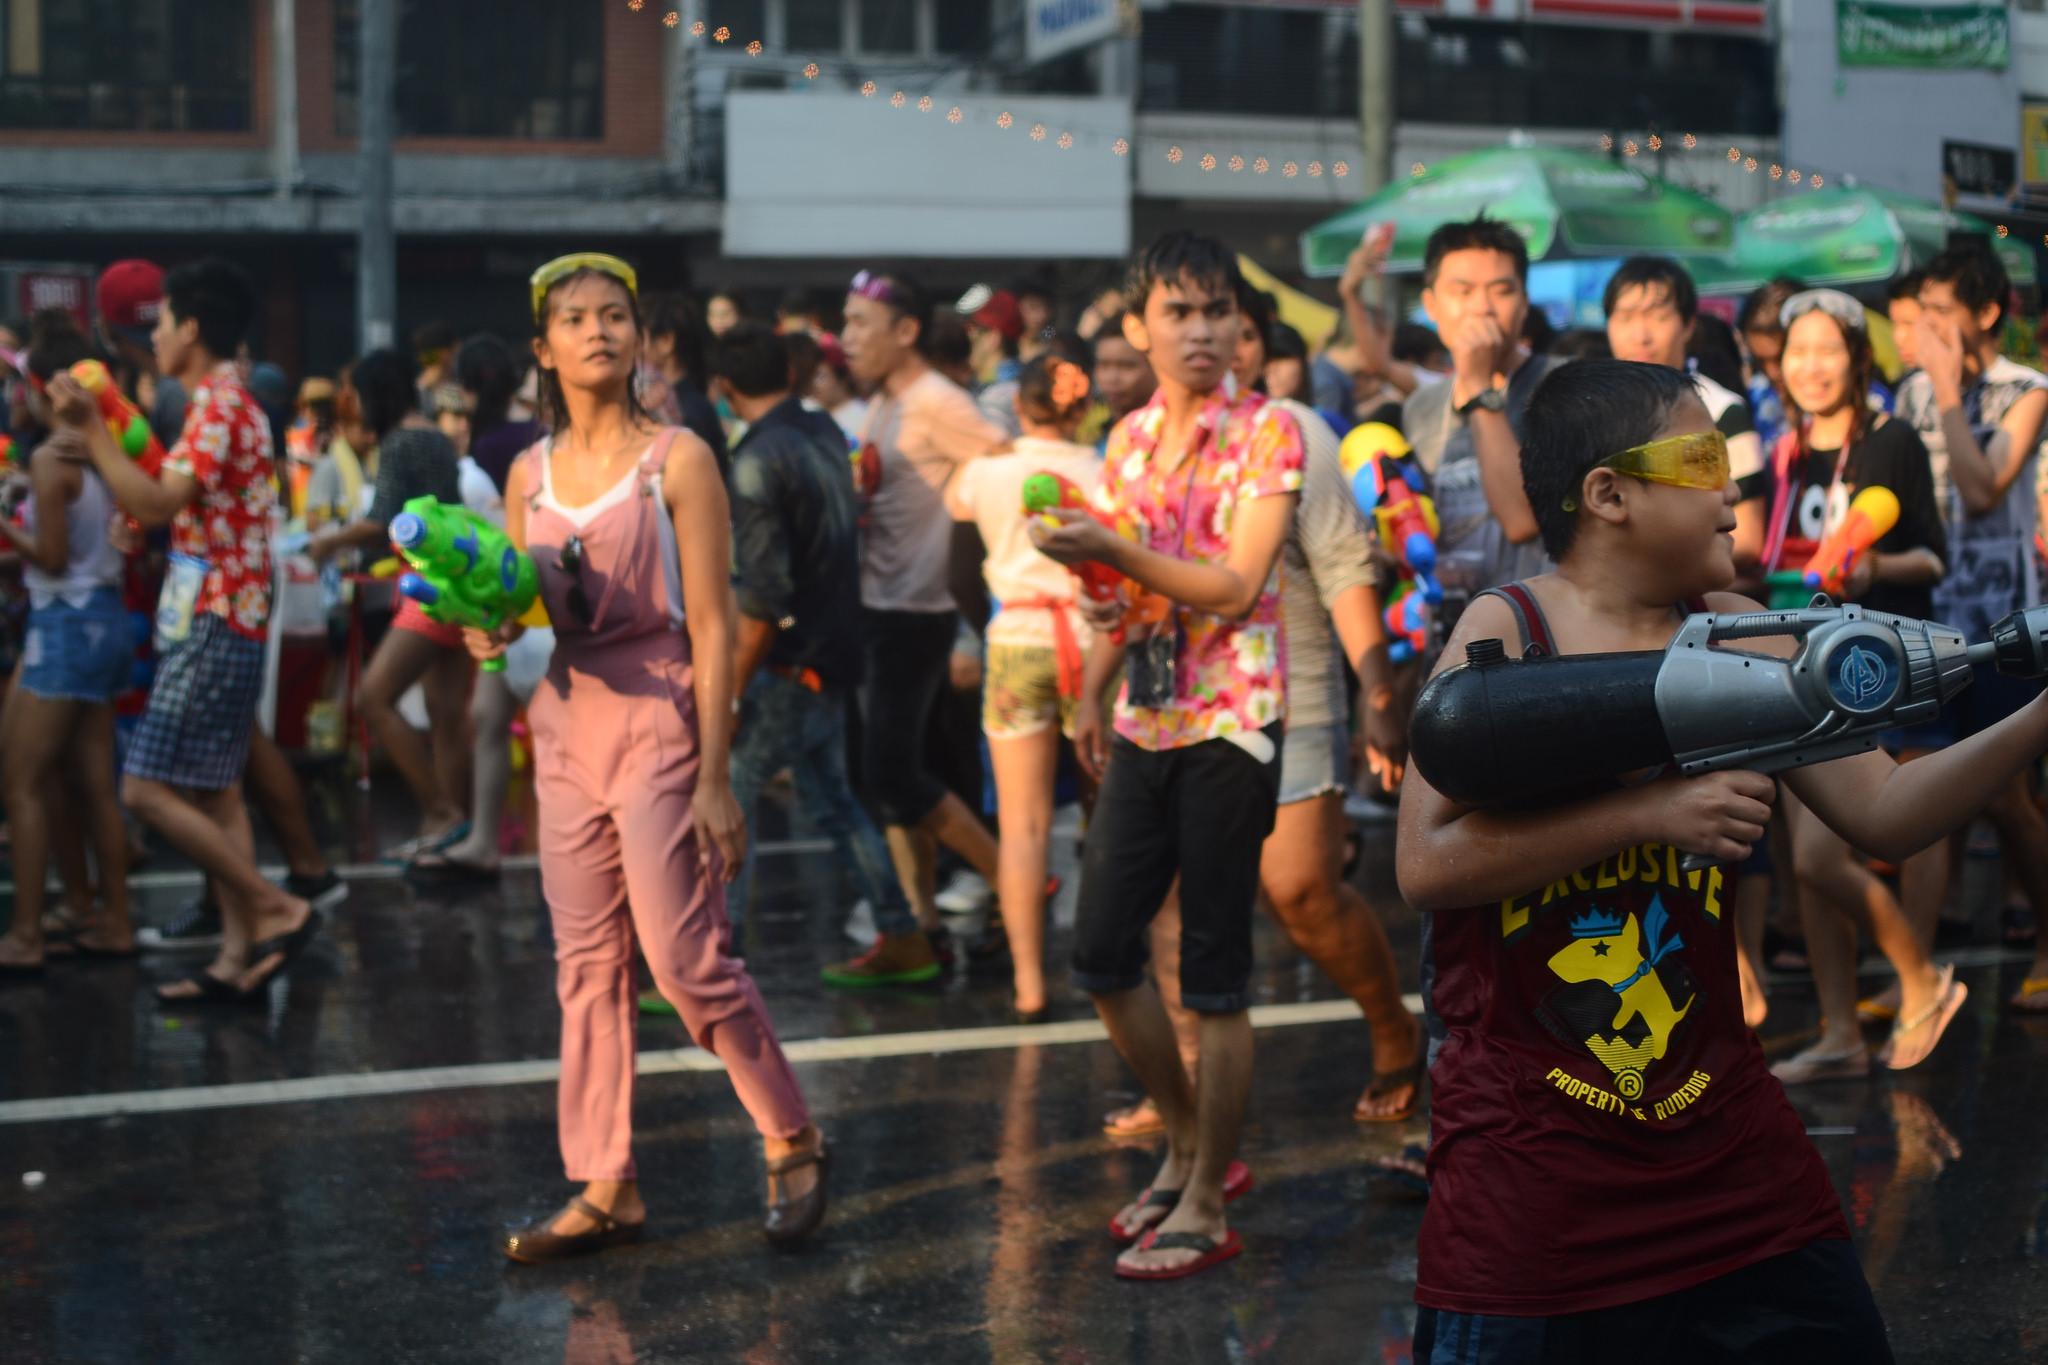 Image Credit: Songkran Bangkok / Flickr